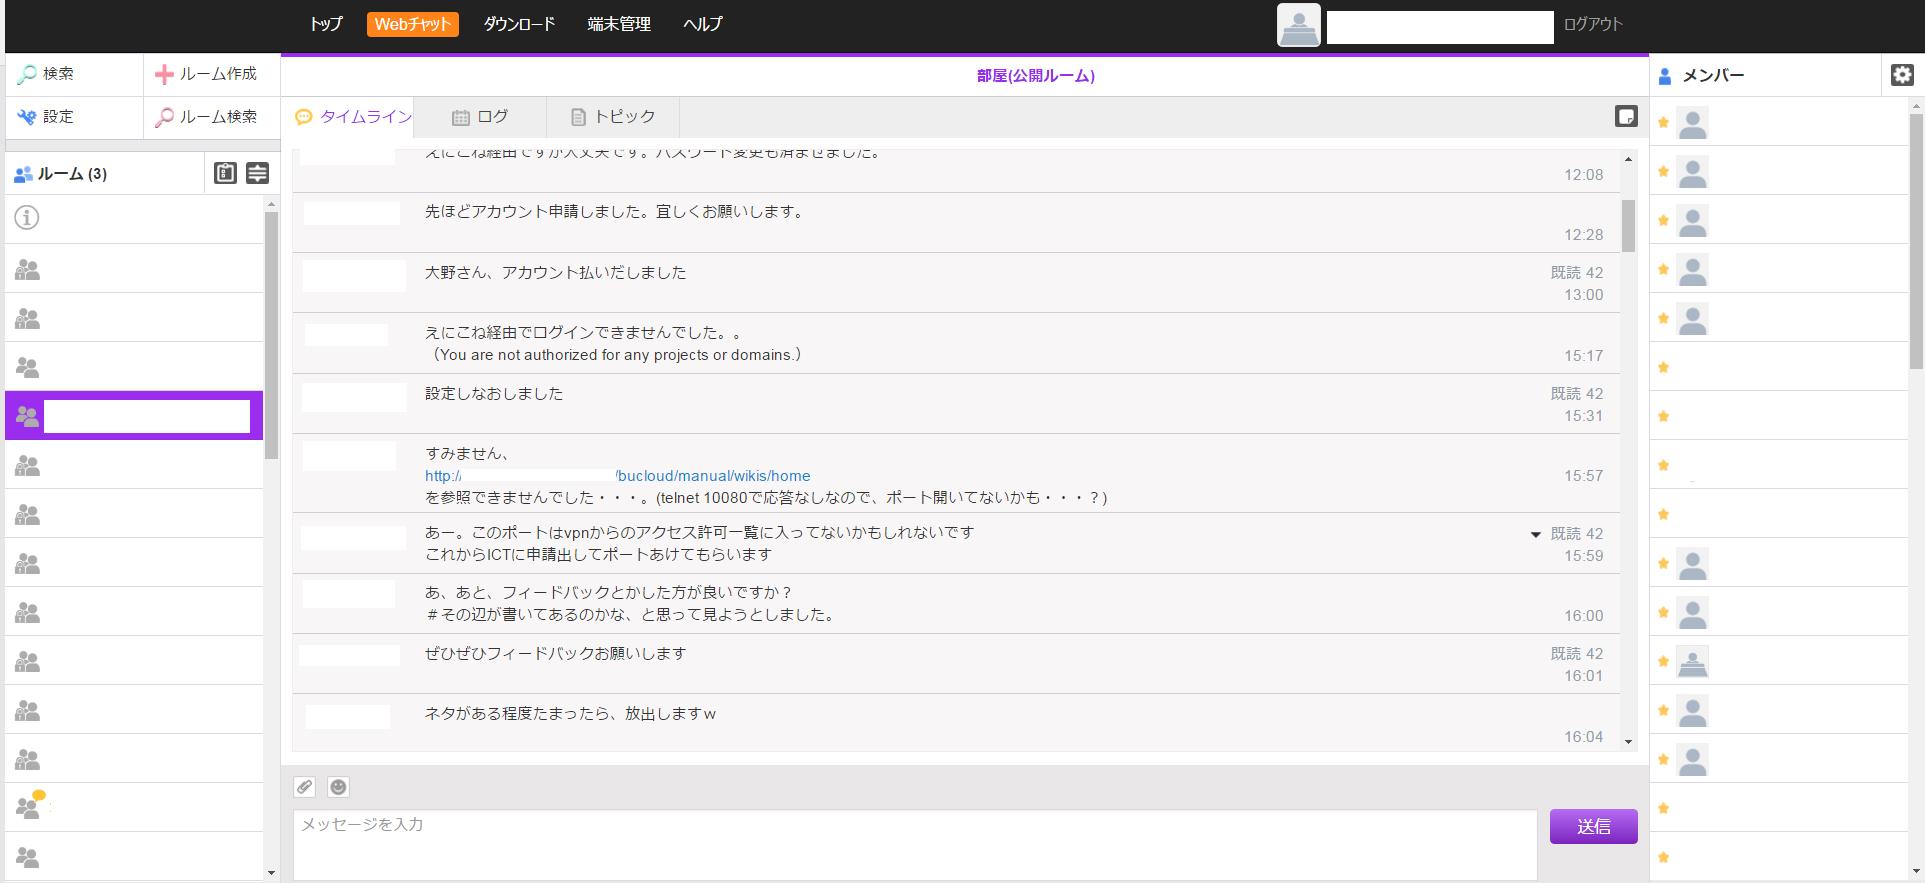 https://www.ntt-tx.co.jp/column/csicloud/topiic2.png